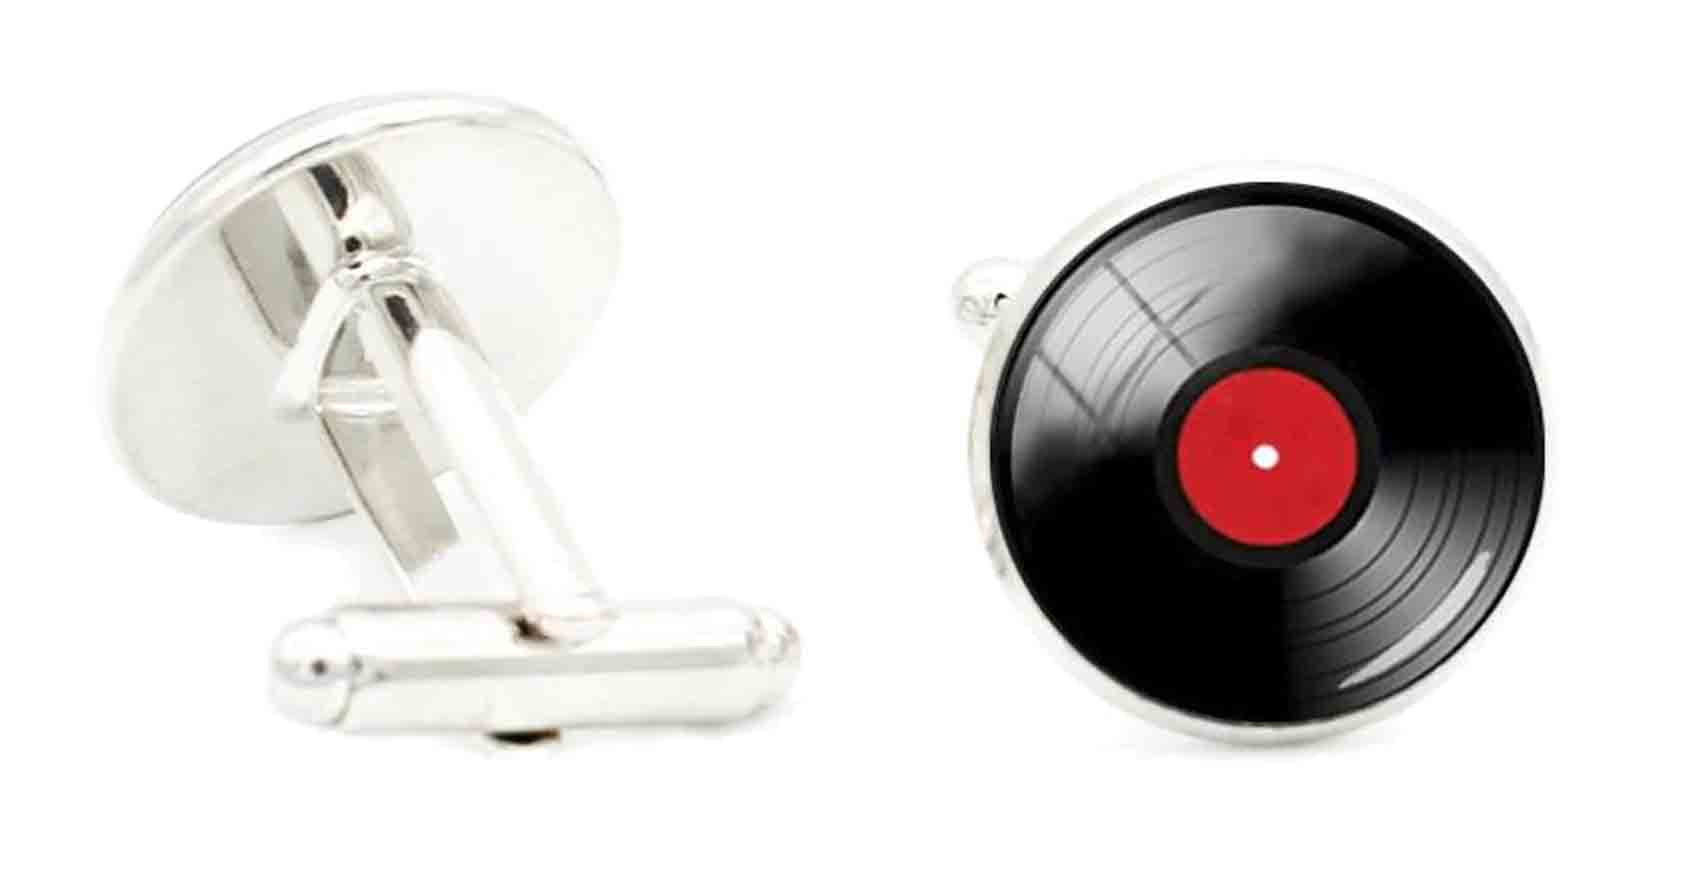 Gascoigne Repro Retro Vinyl Disc Cufflinks Silver Black Red Men's